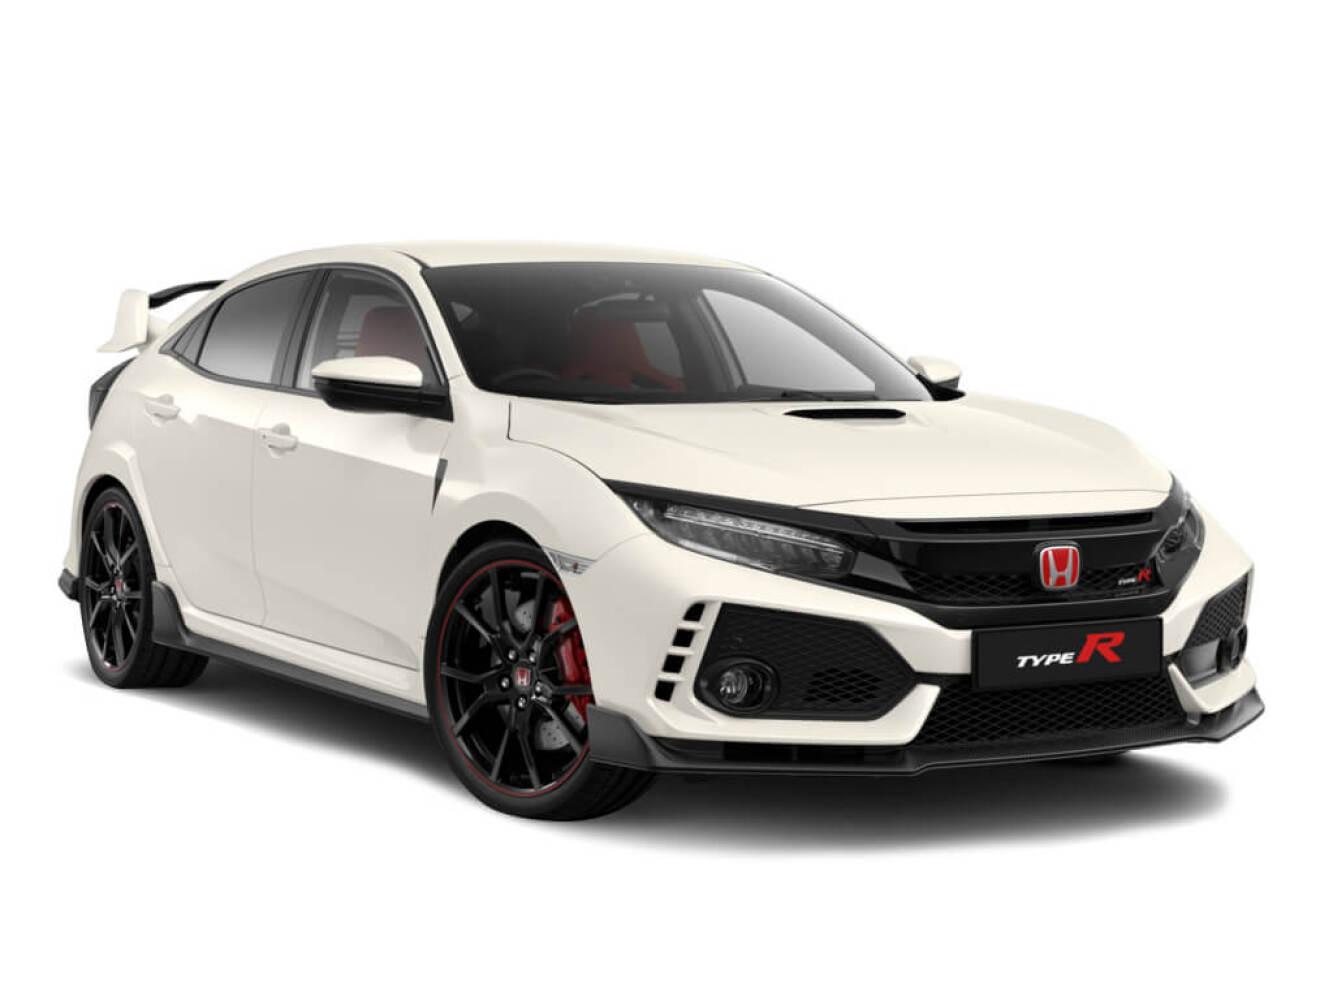 New Honda Civic Type R 2.0 VTEC Turbo Type R 5dr Petrol ...